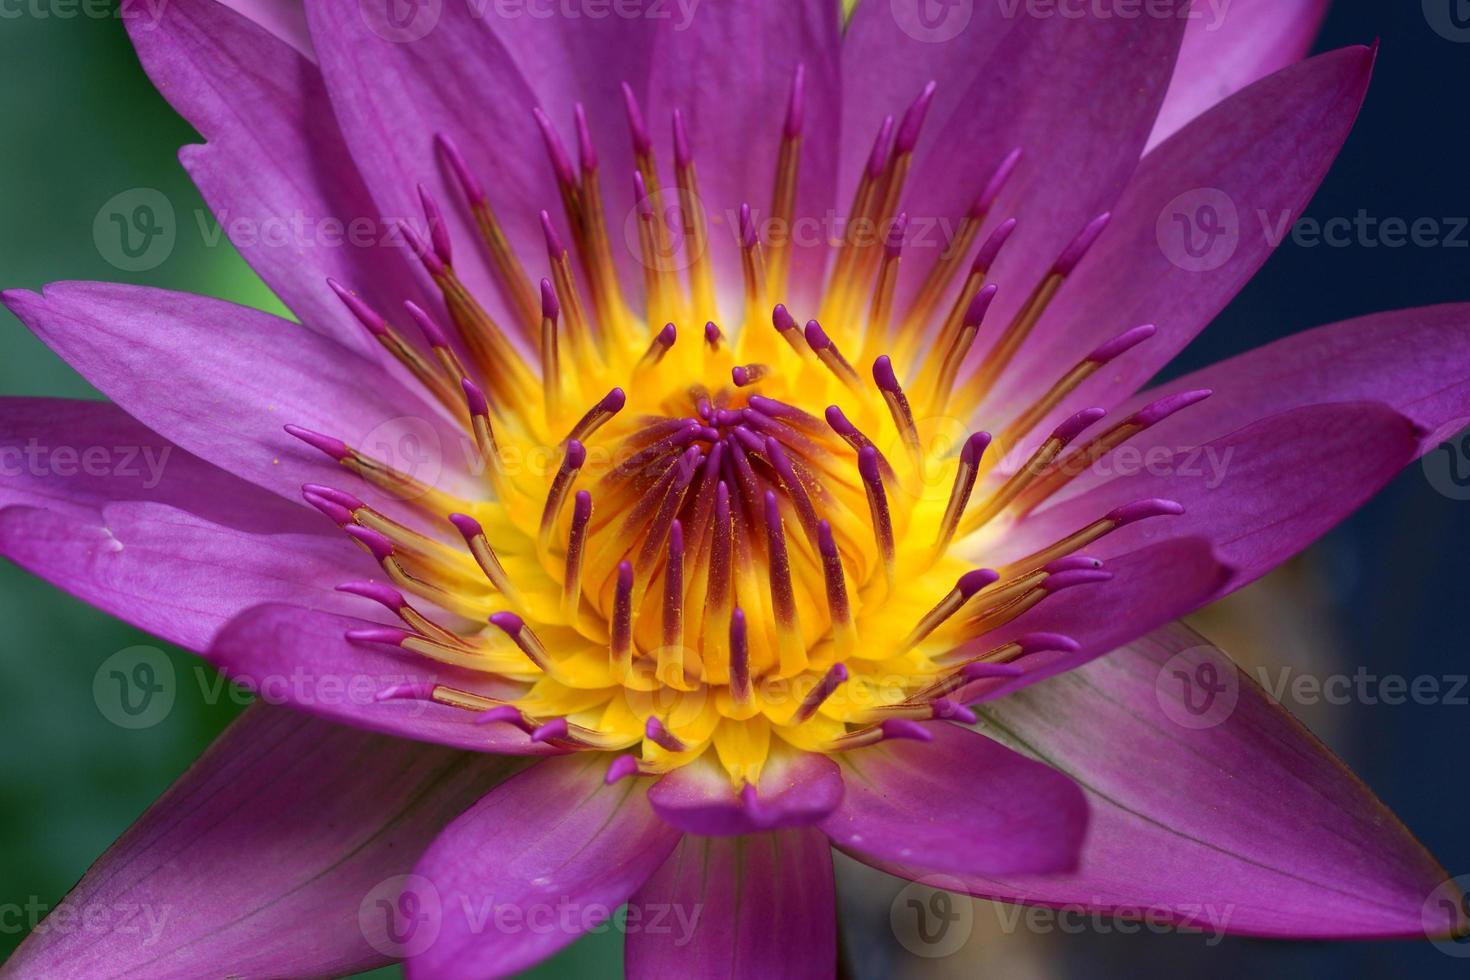 roze lotusbloem, waterlelie. foto